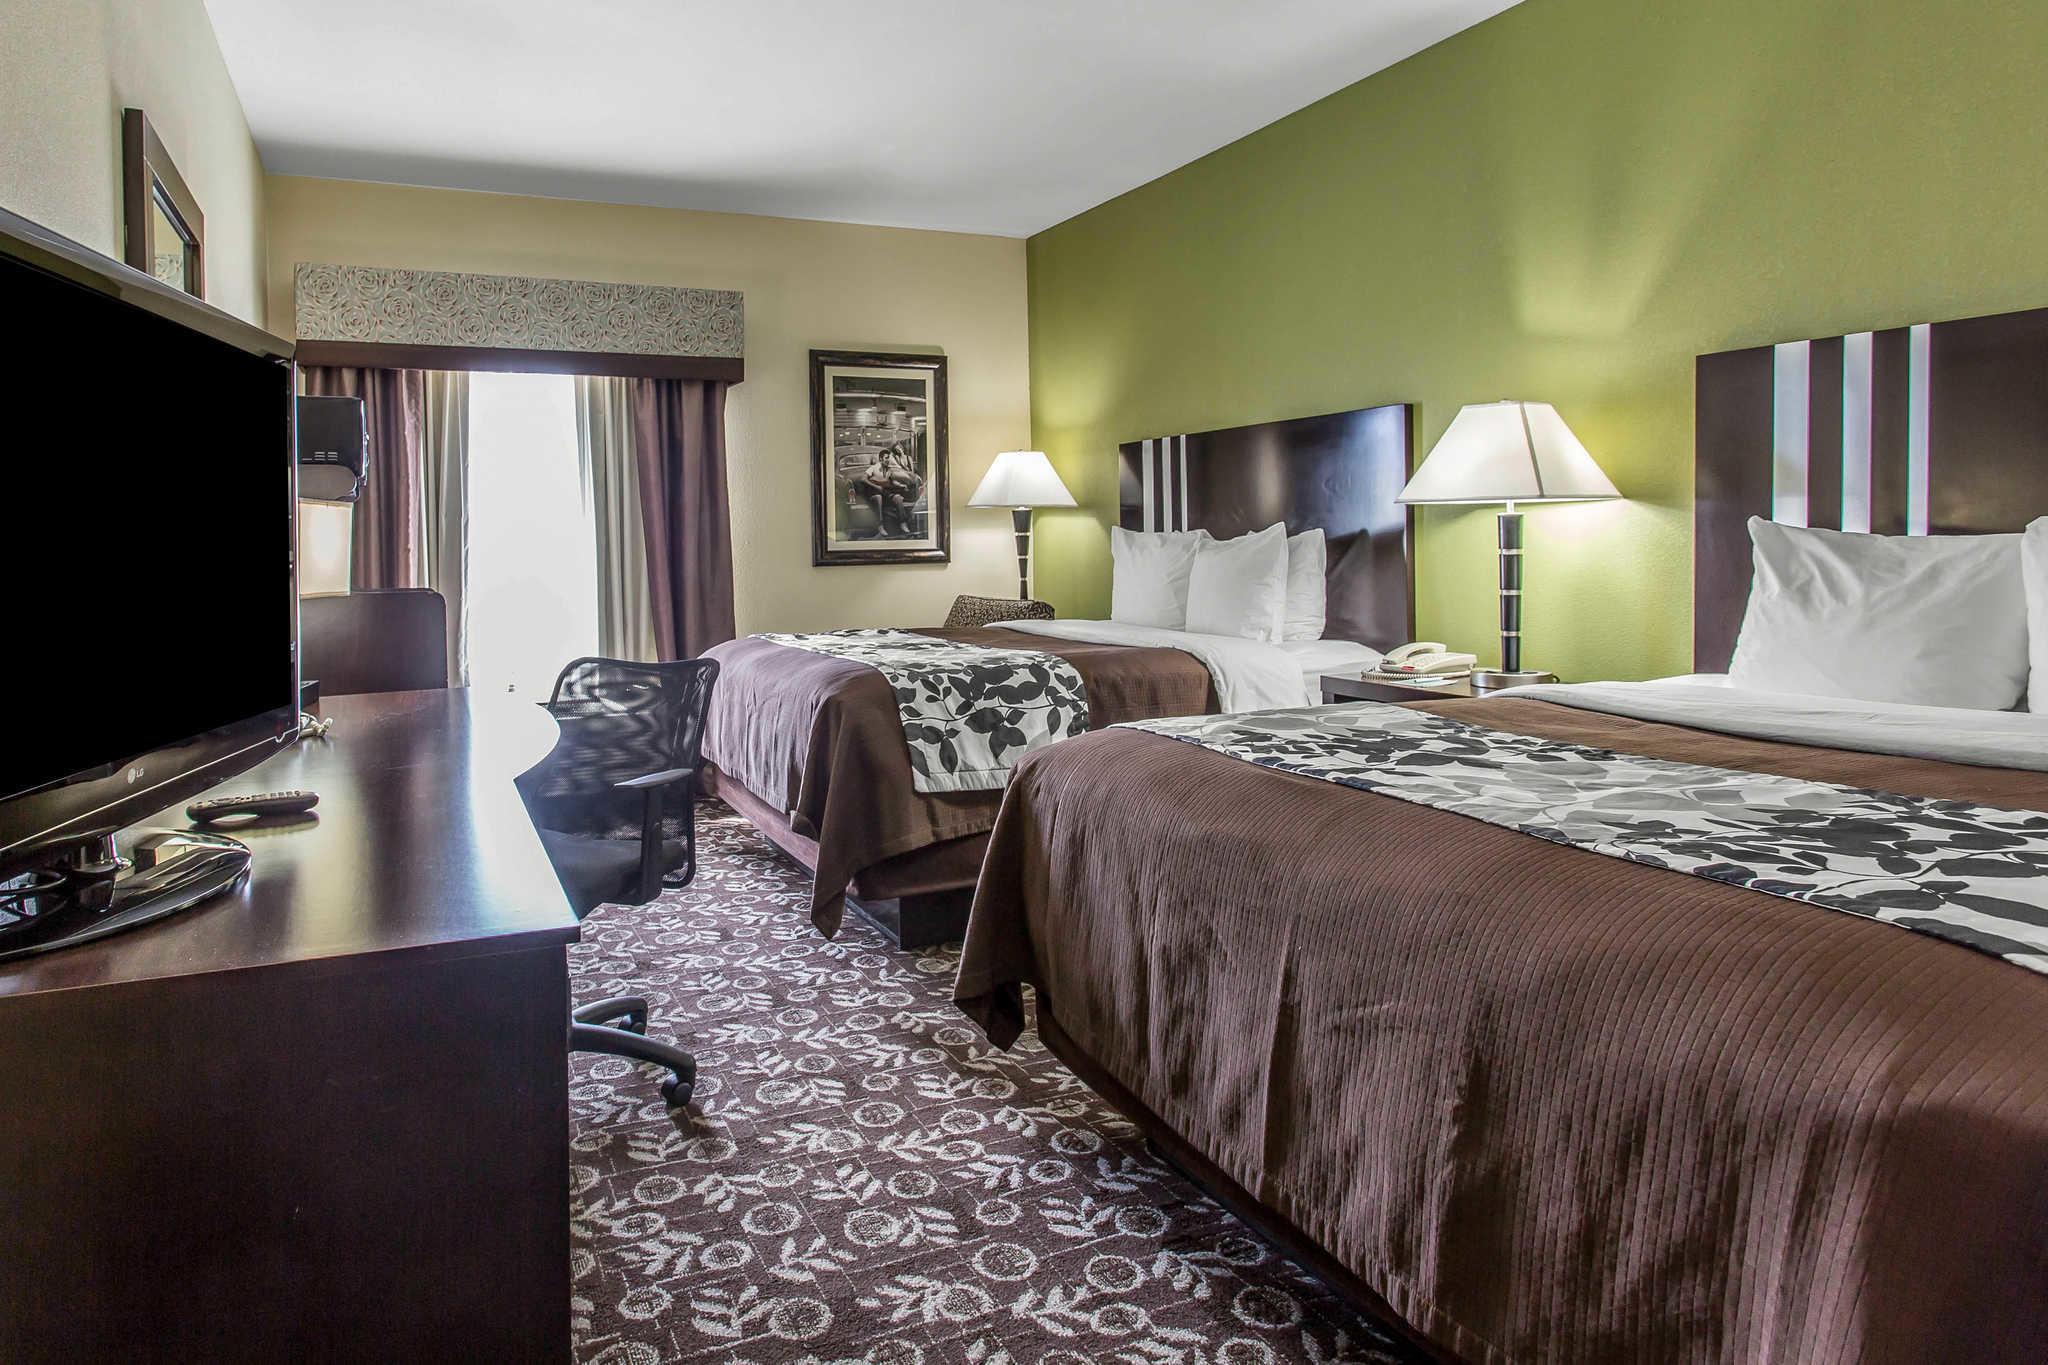 Sleep Inn & Suites West Medical Center image 14